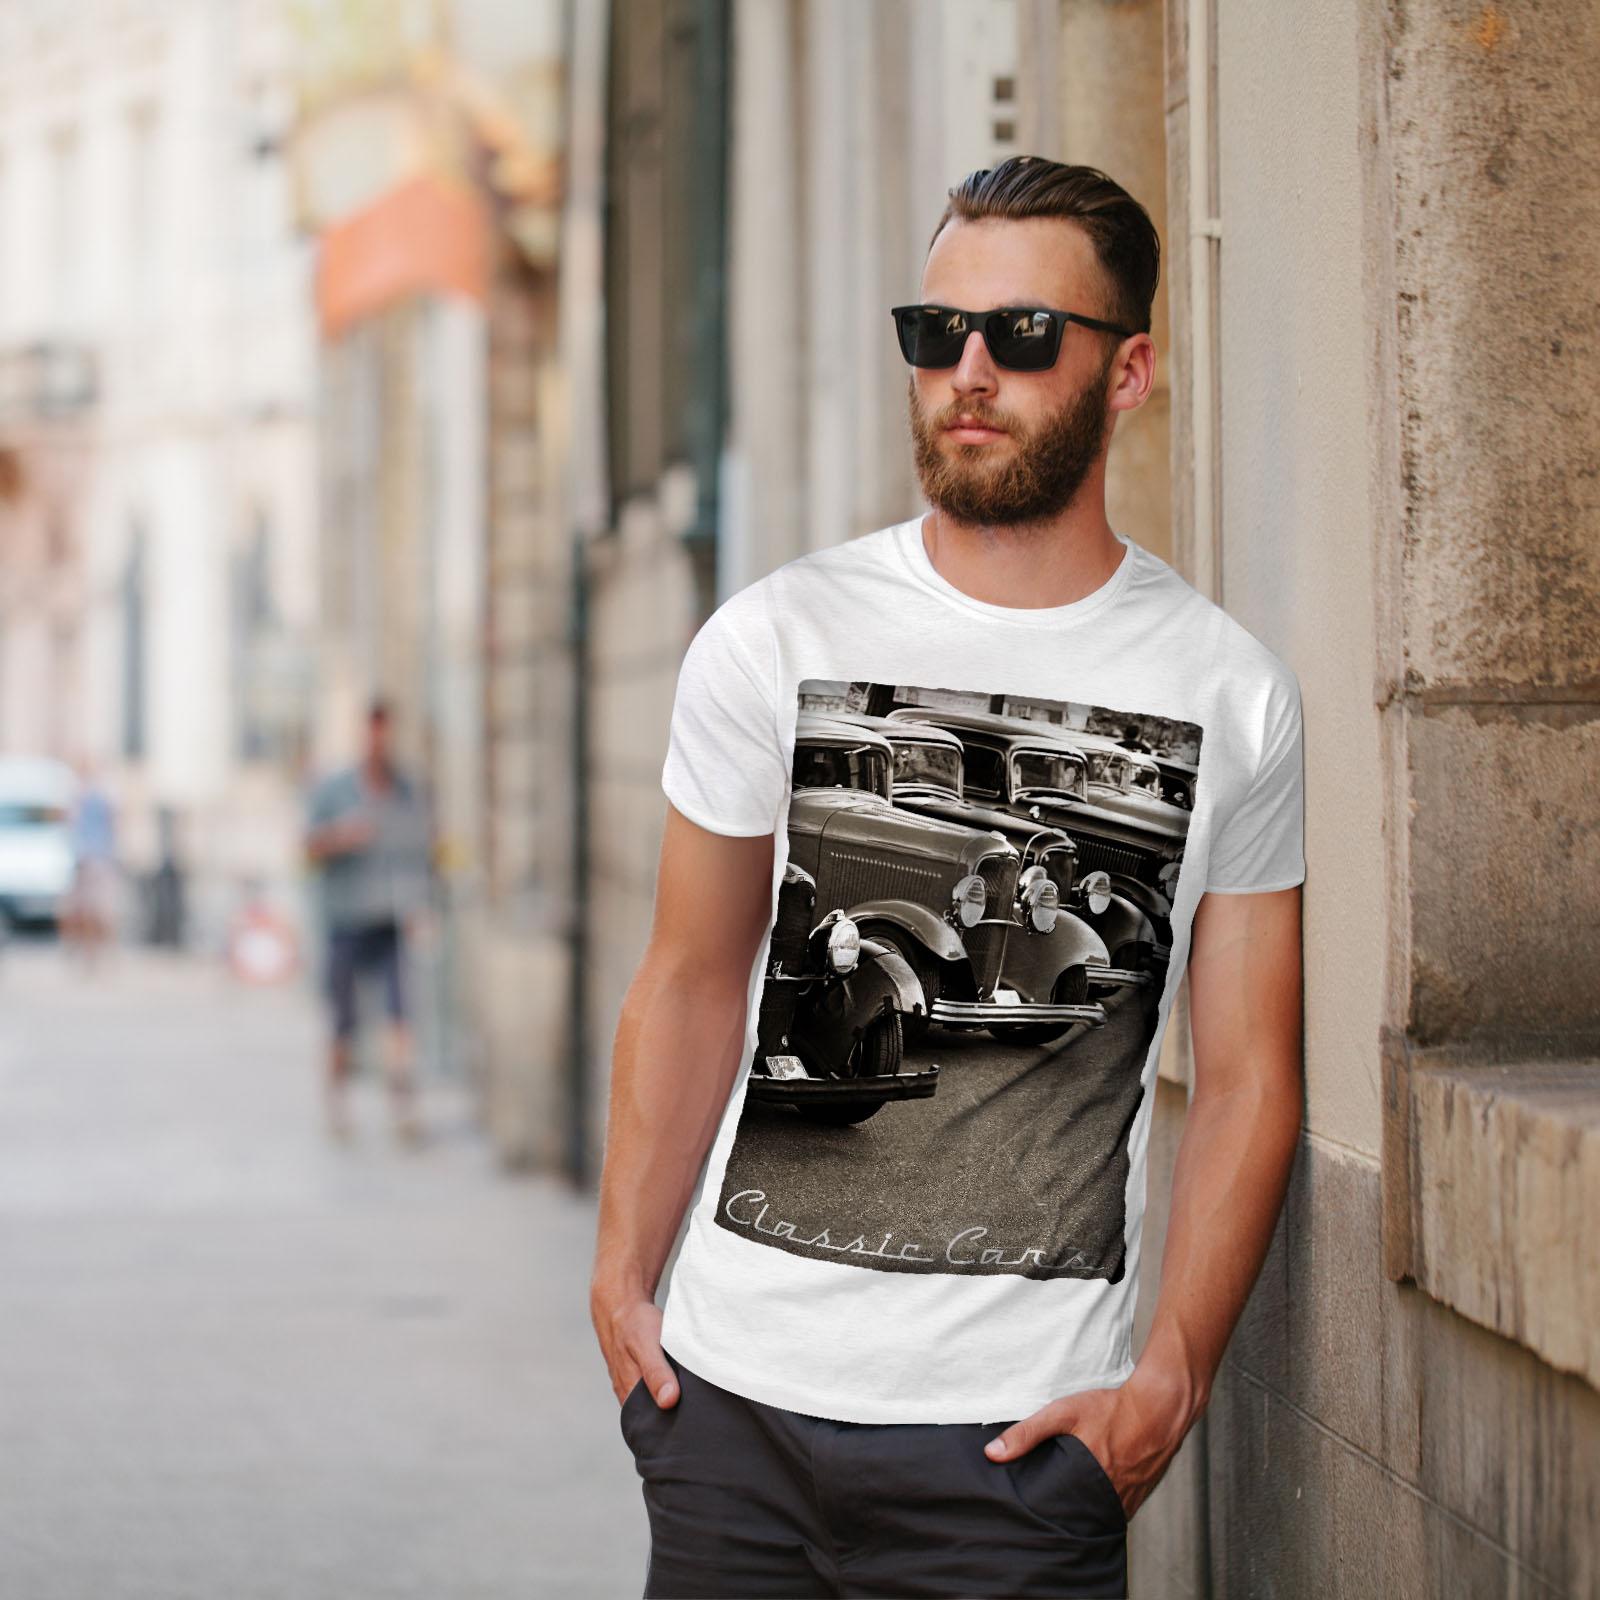 Wellcoda-Classic-Cars-Mens-T-shirt-Retro-Graphic-Design-Printed-Tee thumbnail 11